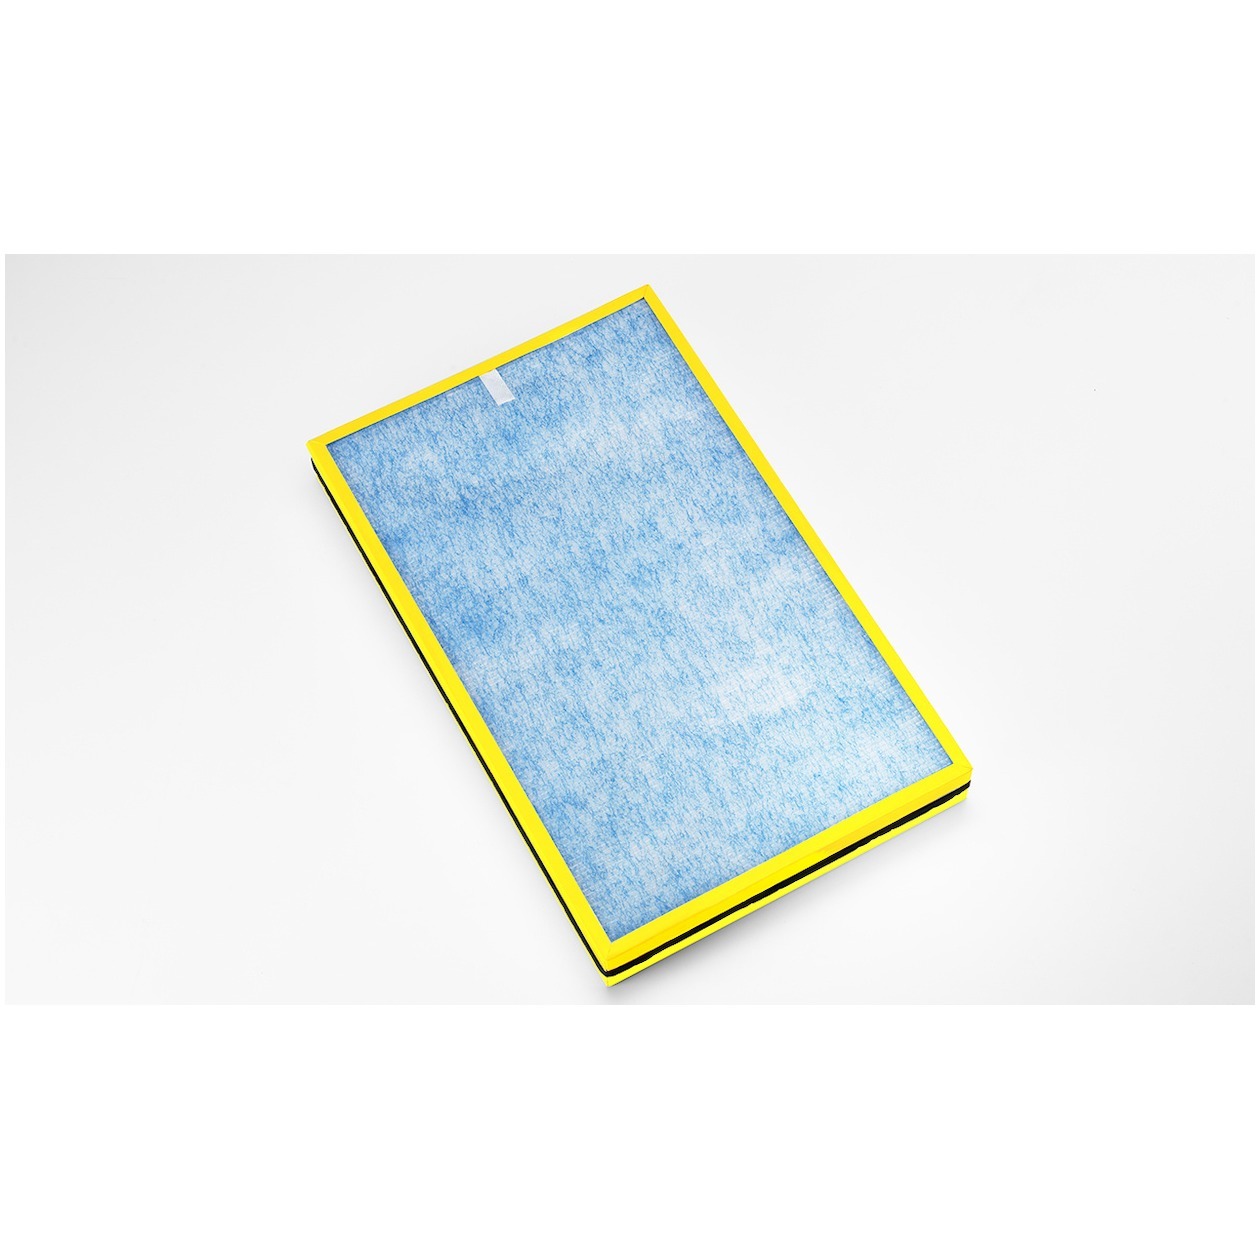 Boneco klimaat accessoire Filter A401